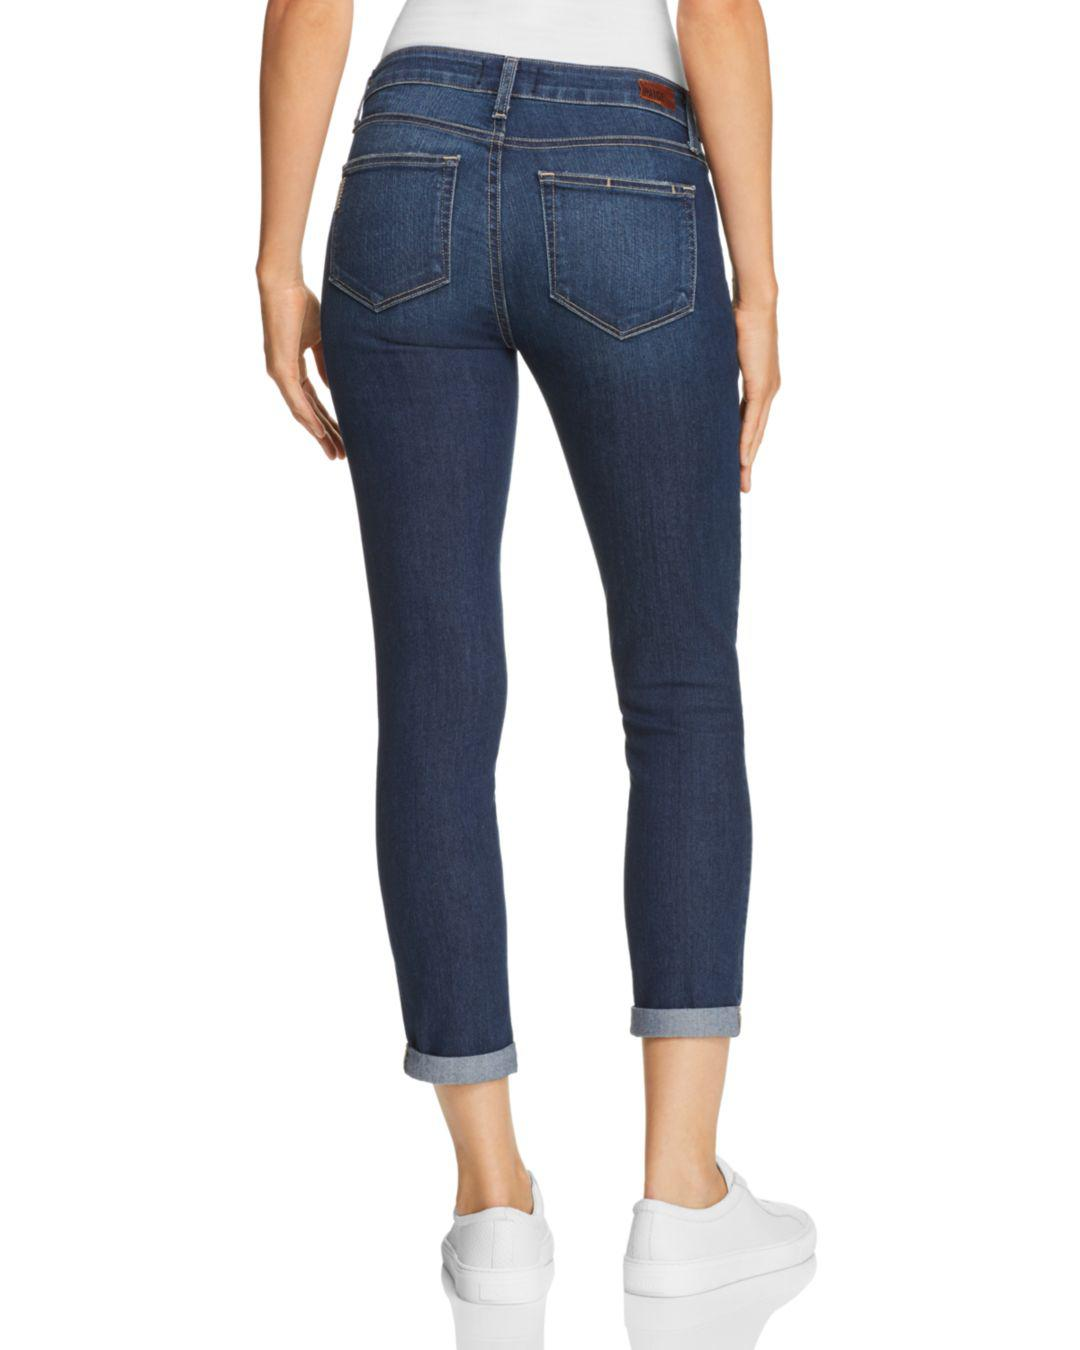 PAIGE Denim Kylie Cuffed Crop Skinny Jeans In Amelle in Blue